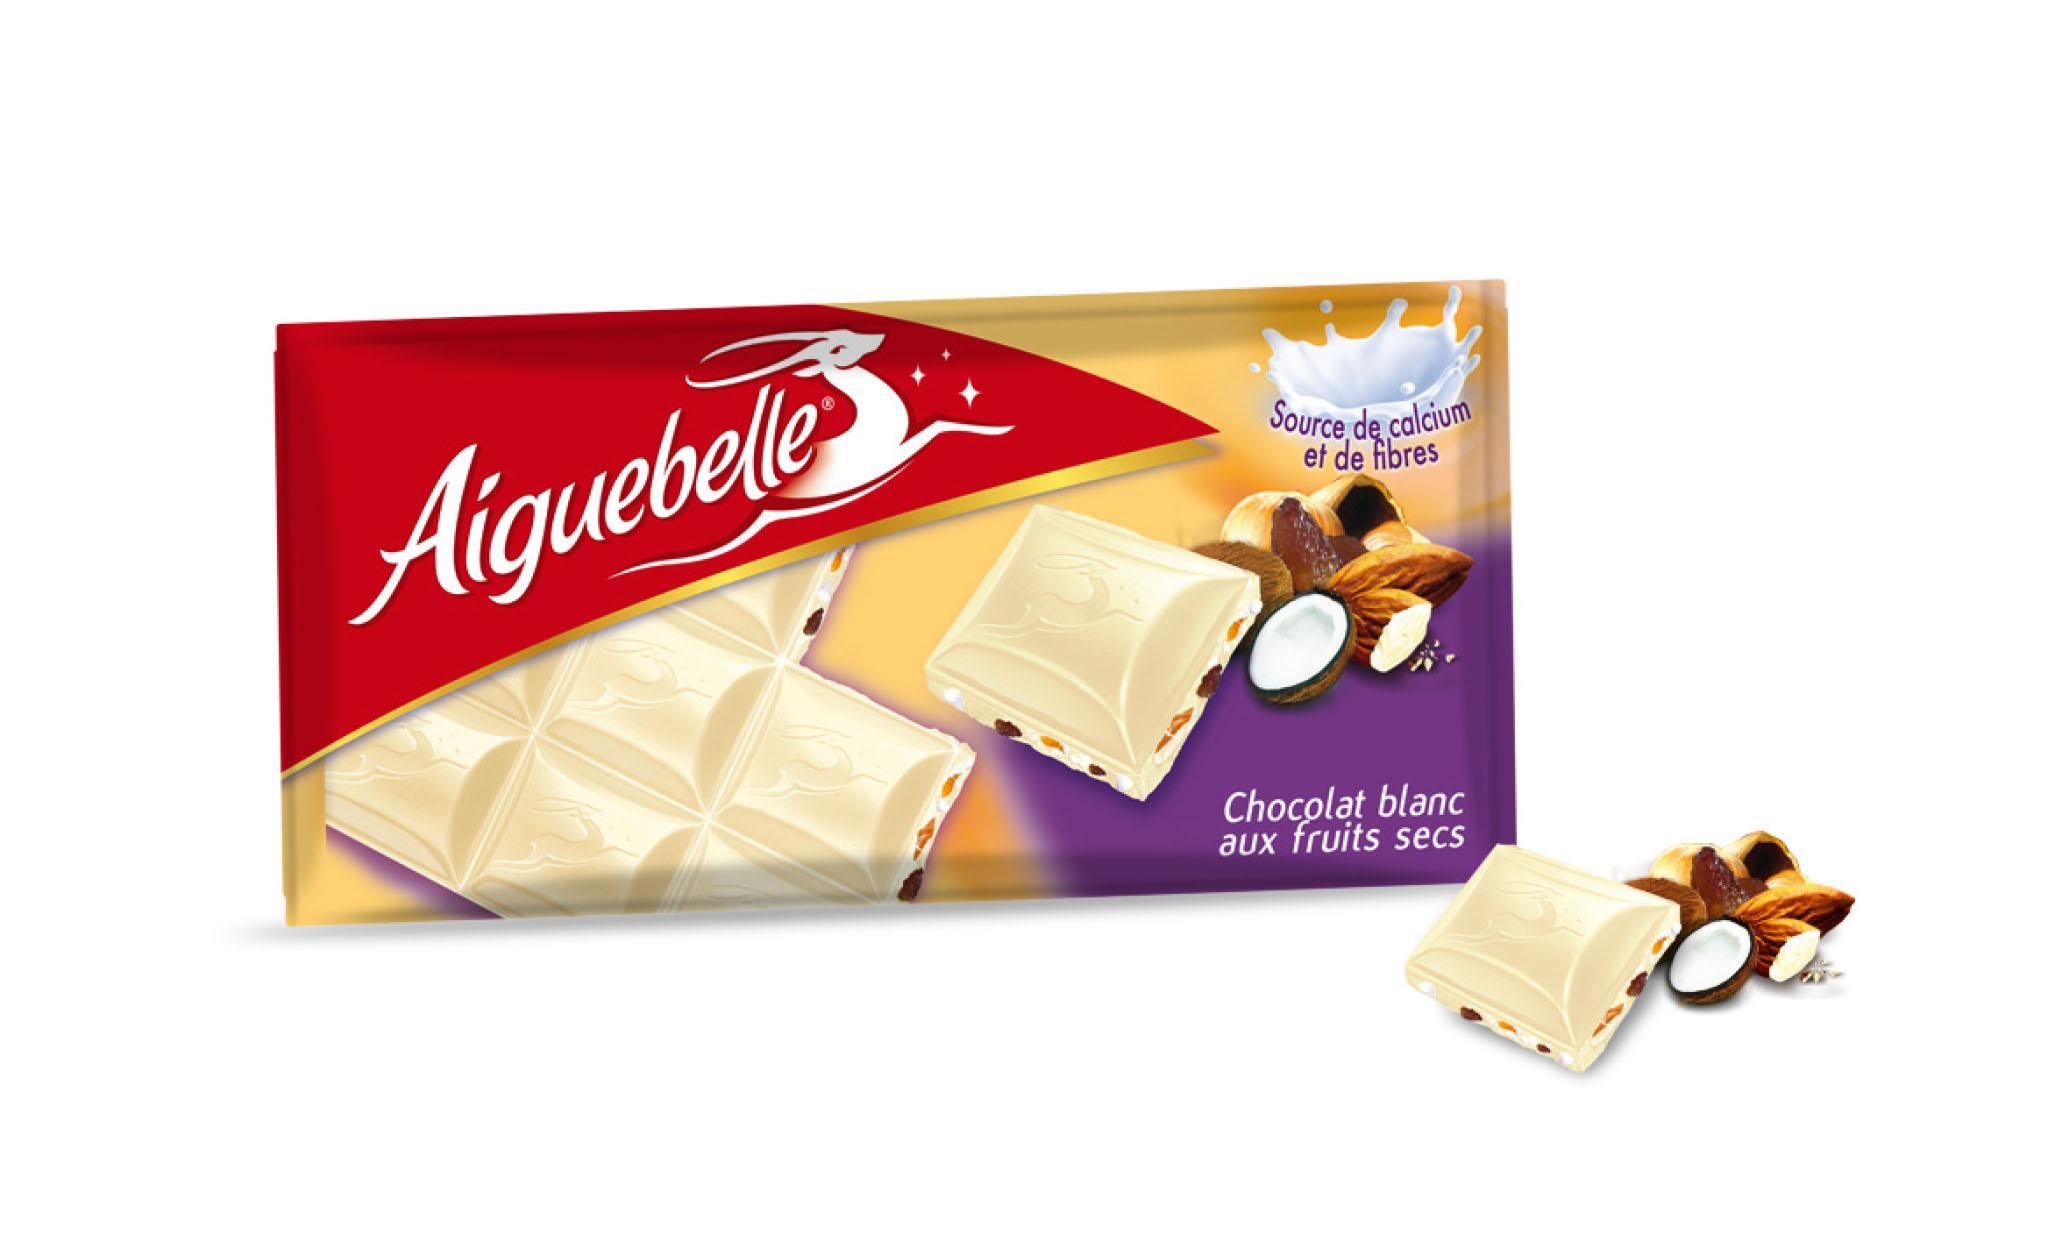 Packaging chocolat blanc aux fruits secs Aiguebelle